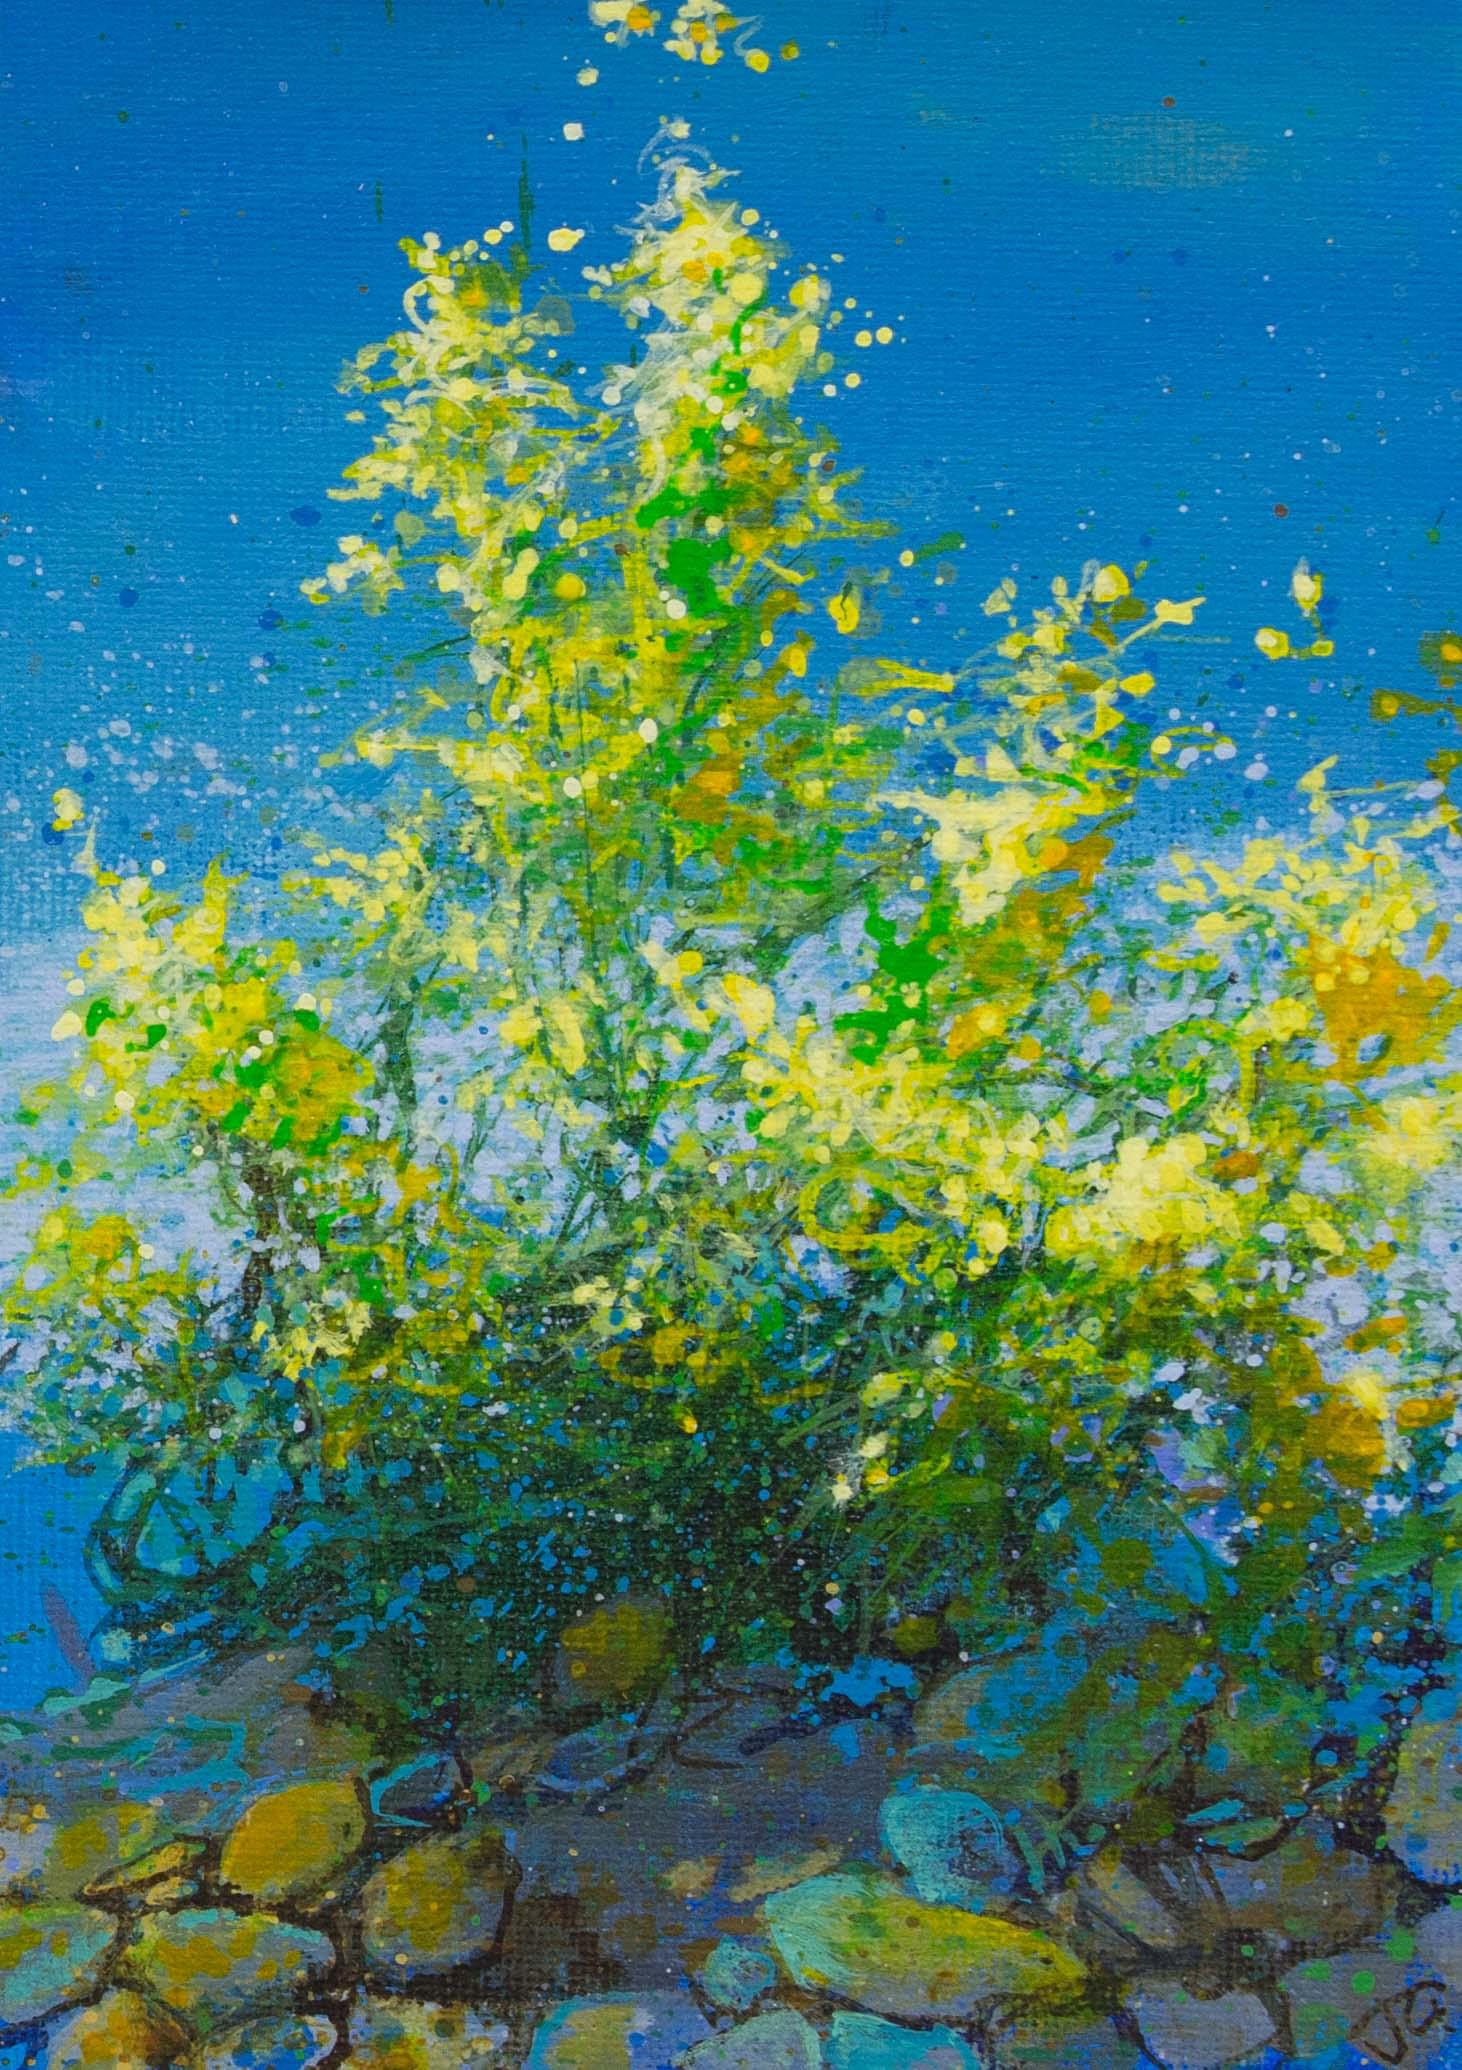 Blue & gold summer days 32x26cm.jpg